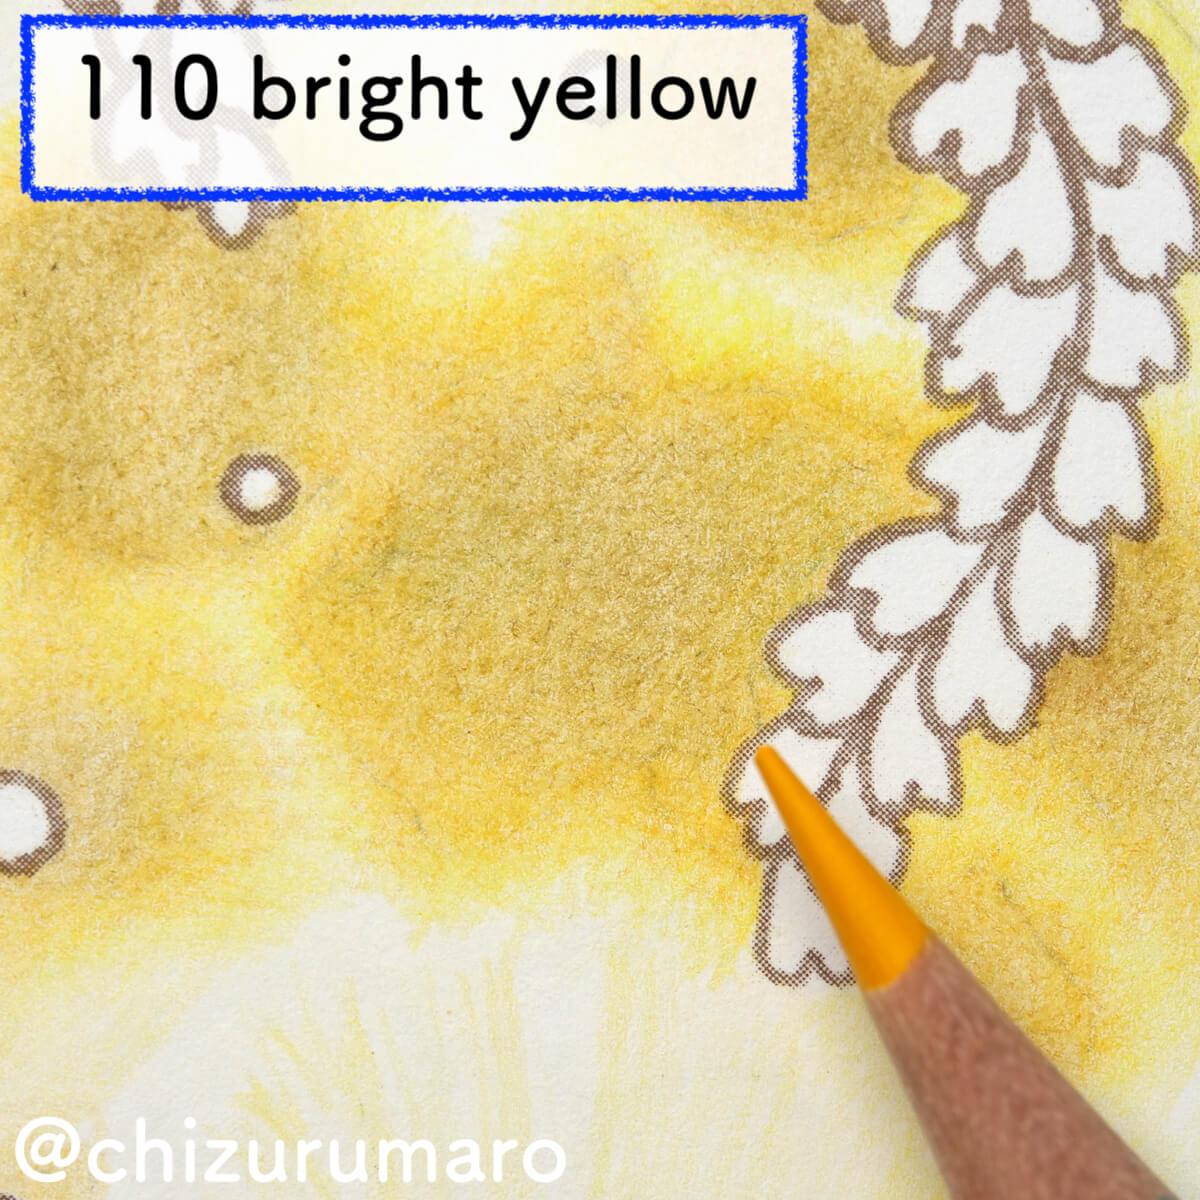 f:id:chizurumaro:20201126114740j:plain